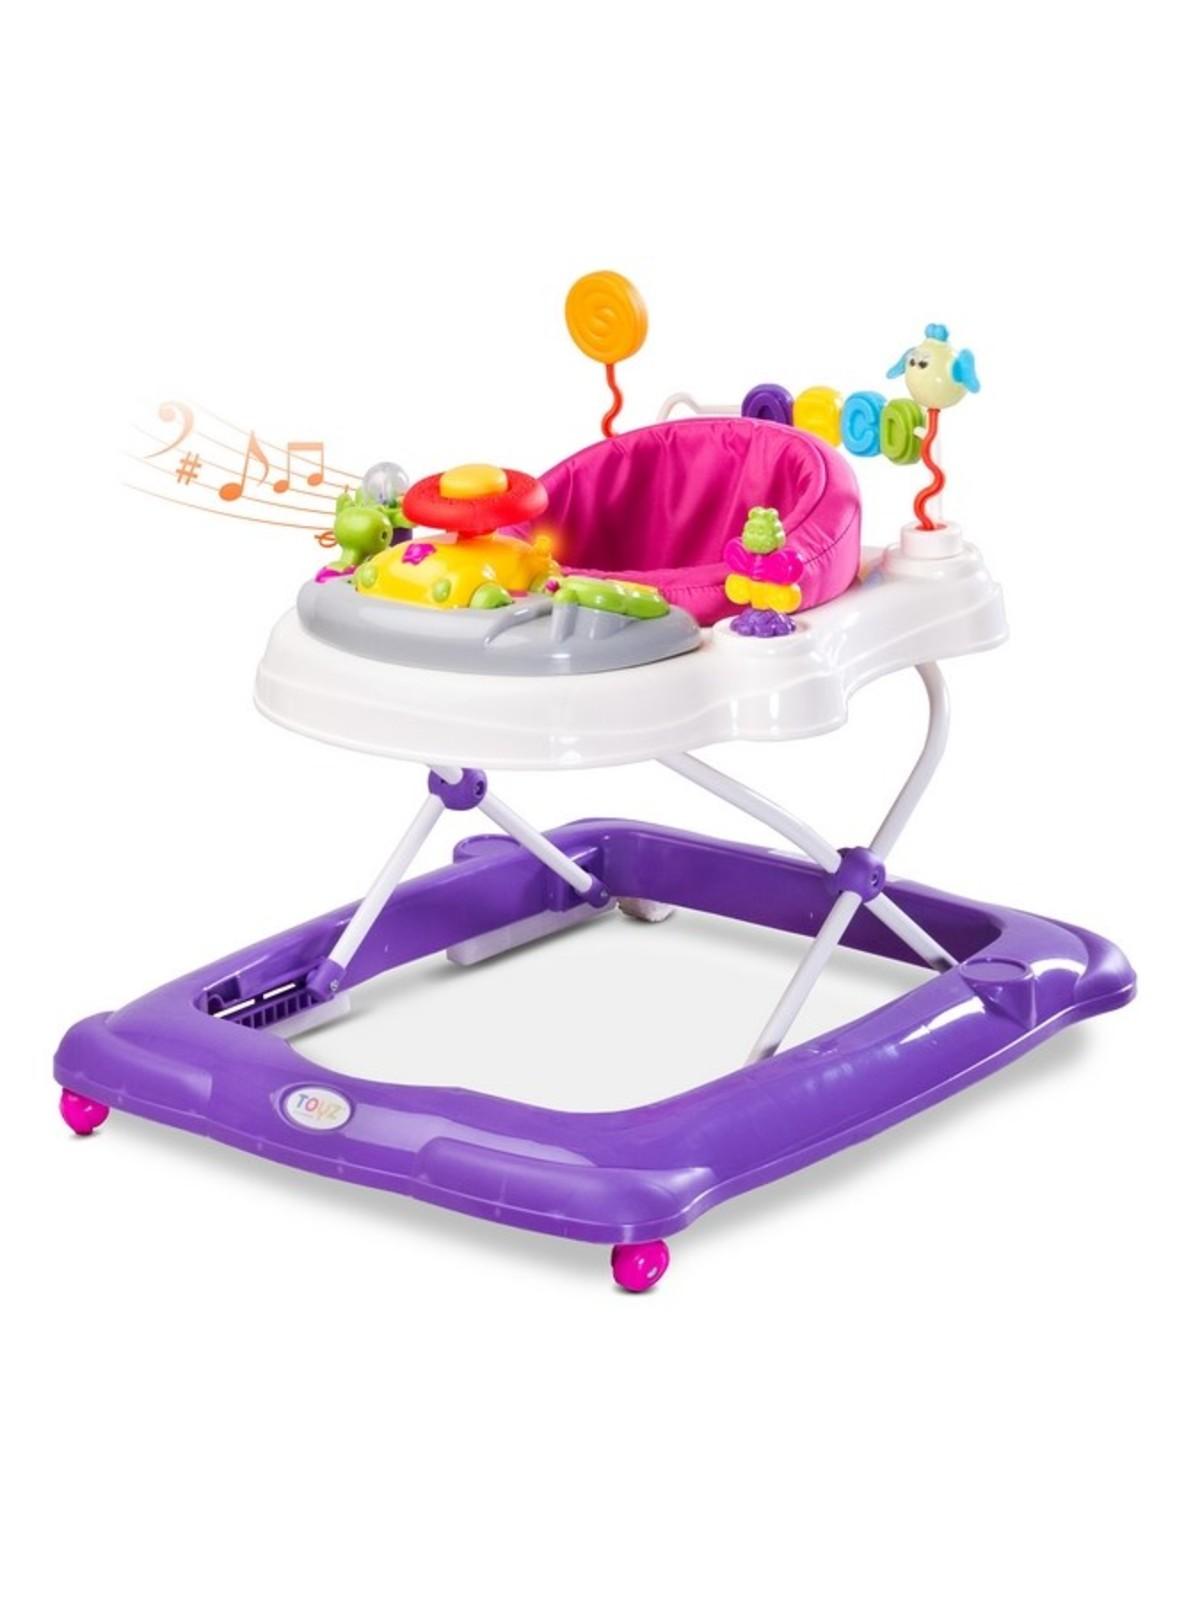 e4d50058149 Dětské chodítko Toyz Stepp purple